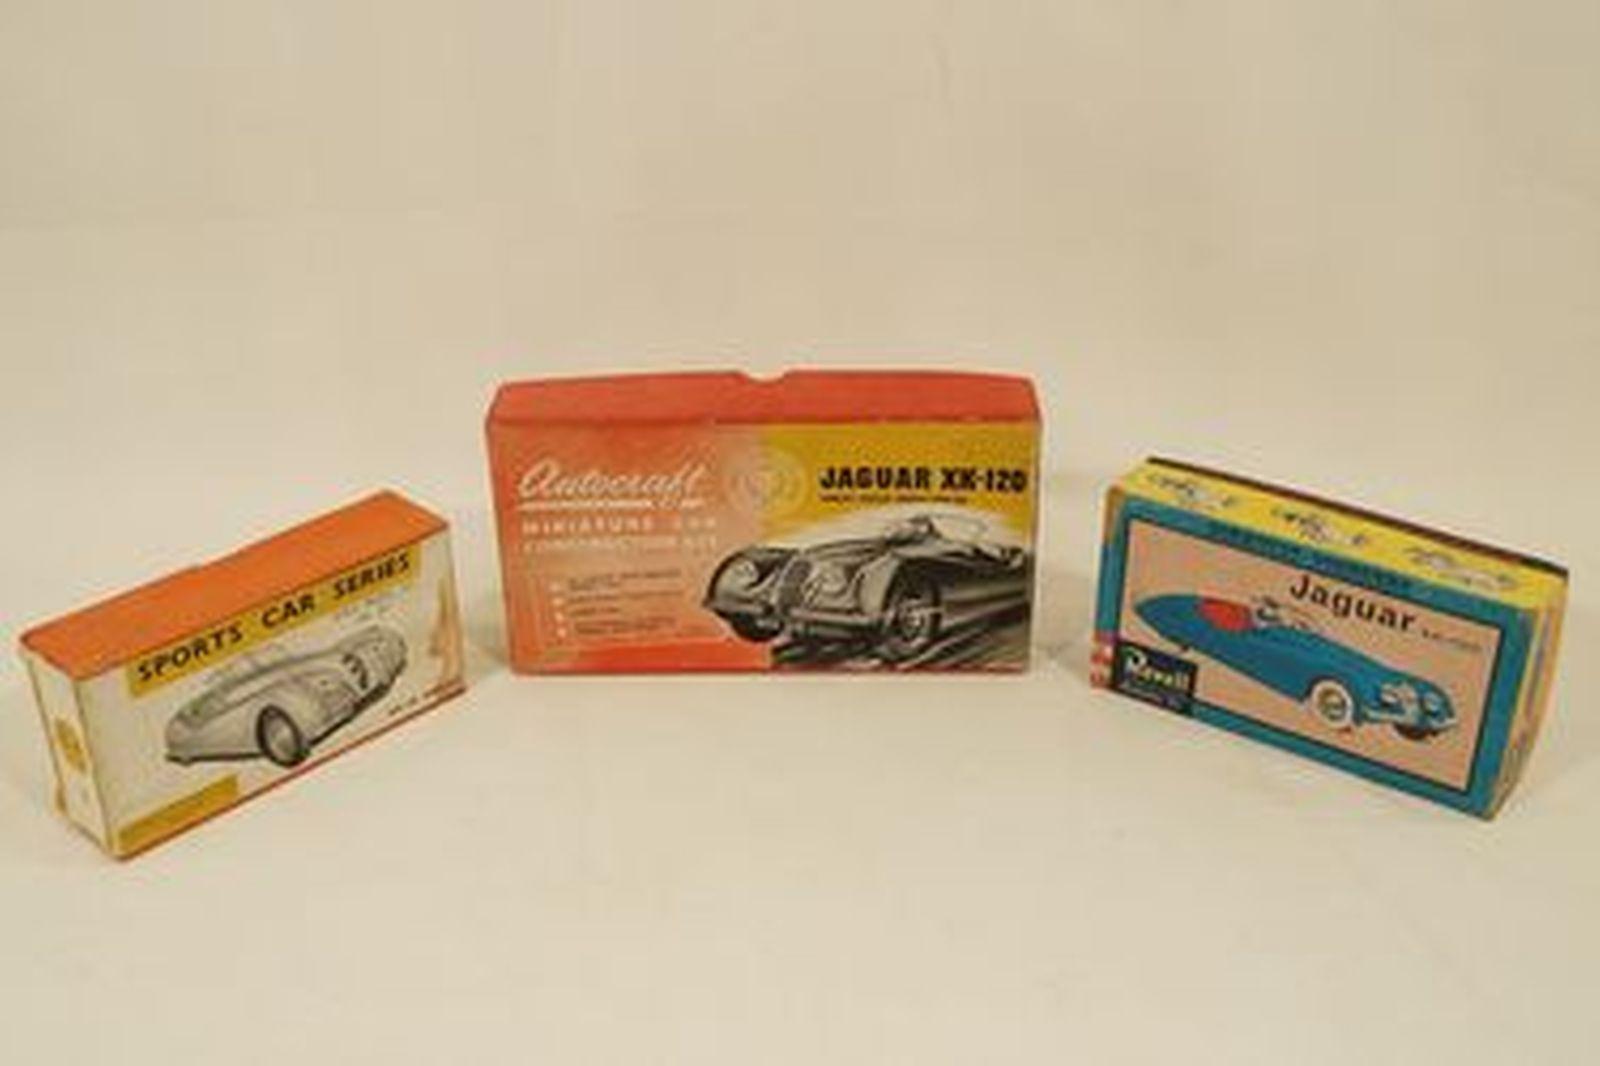 Sold: Model Kits x 3 - Jaguar XK120 by Autocraft, Revell